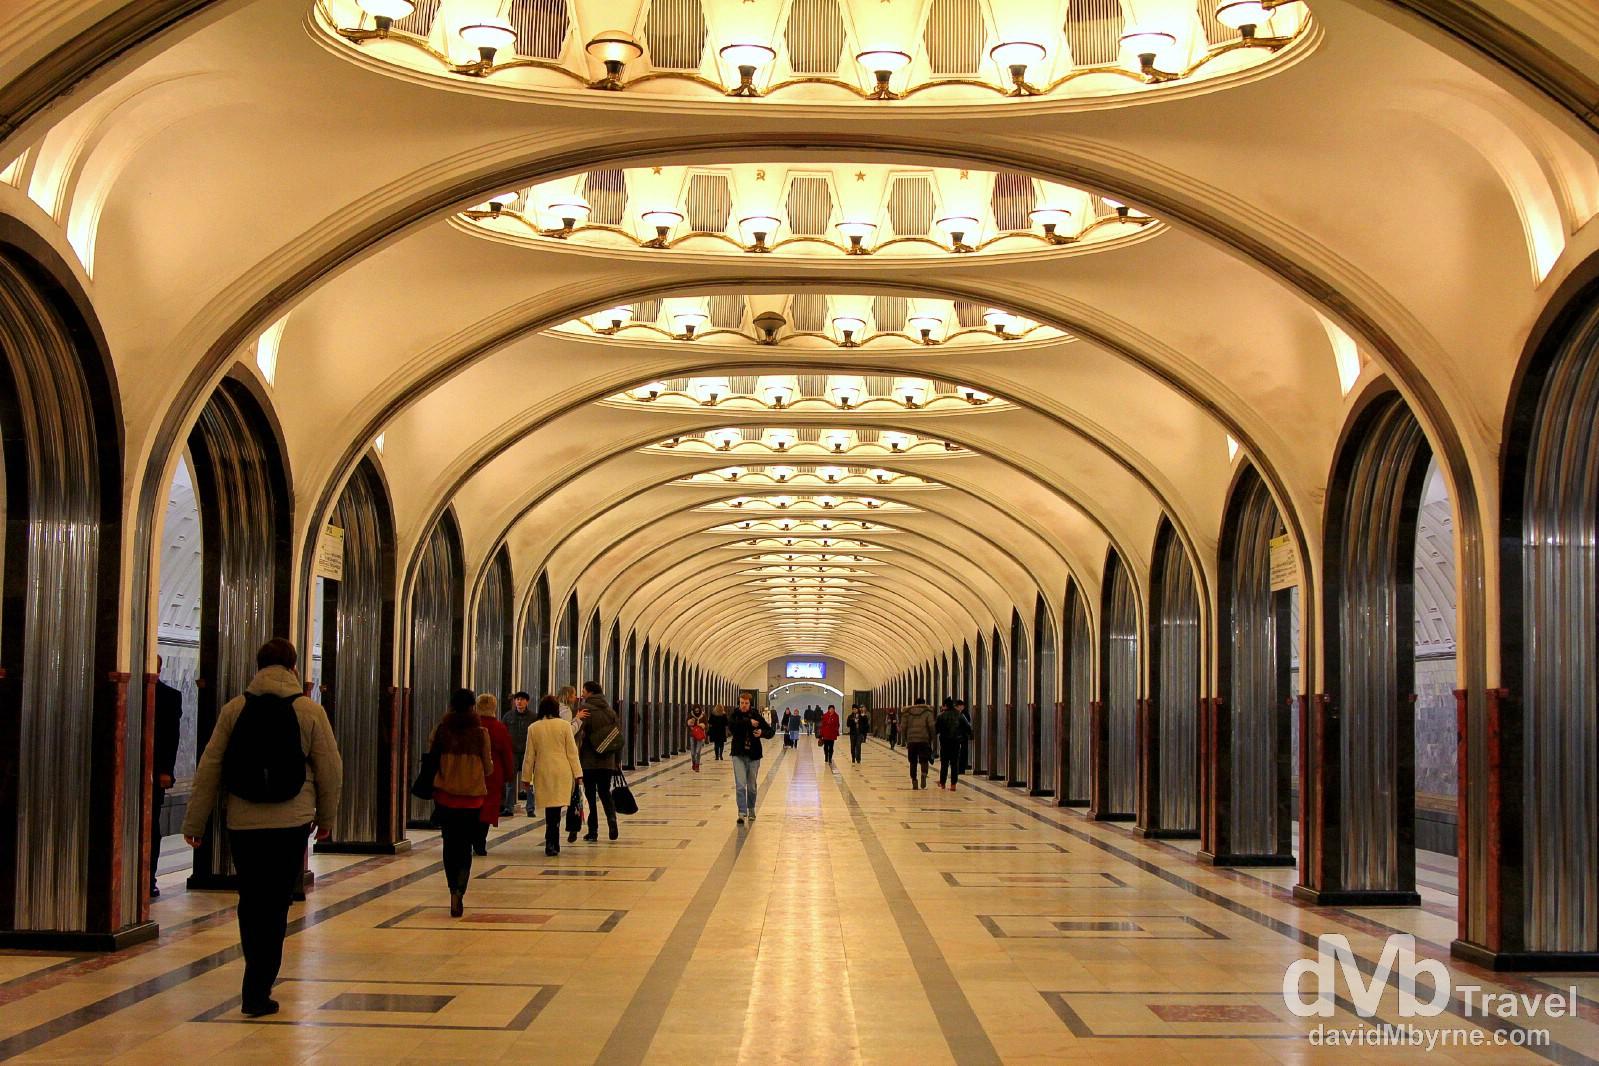 Mayakovskaya metro station on the Zamoskvoretskaya line of the Moscow Metro, Moscow, Russia. November 19th 2012.